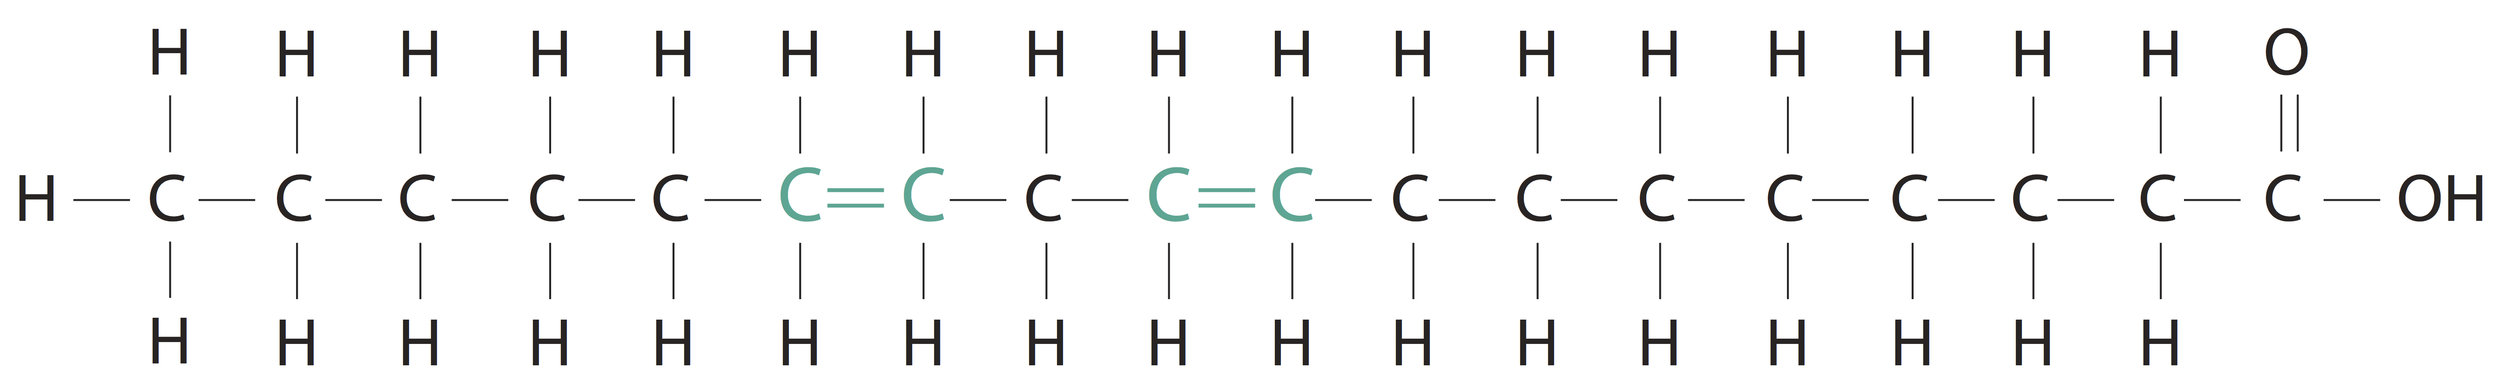 linoleic-acid